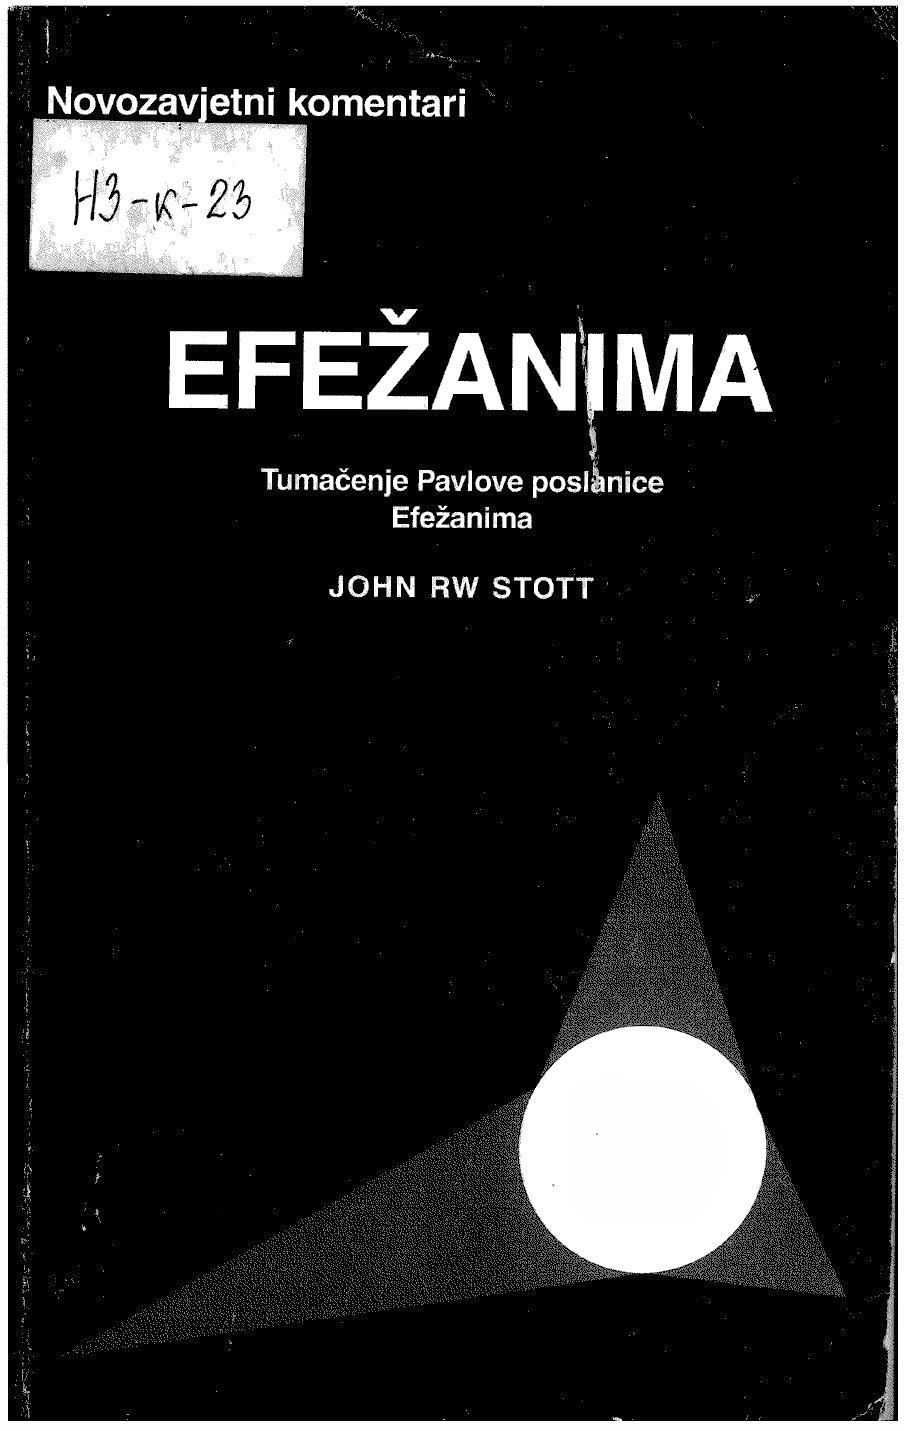 John Stott-Pavlova Poslanica Efežanima:Uvod I Komentar-